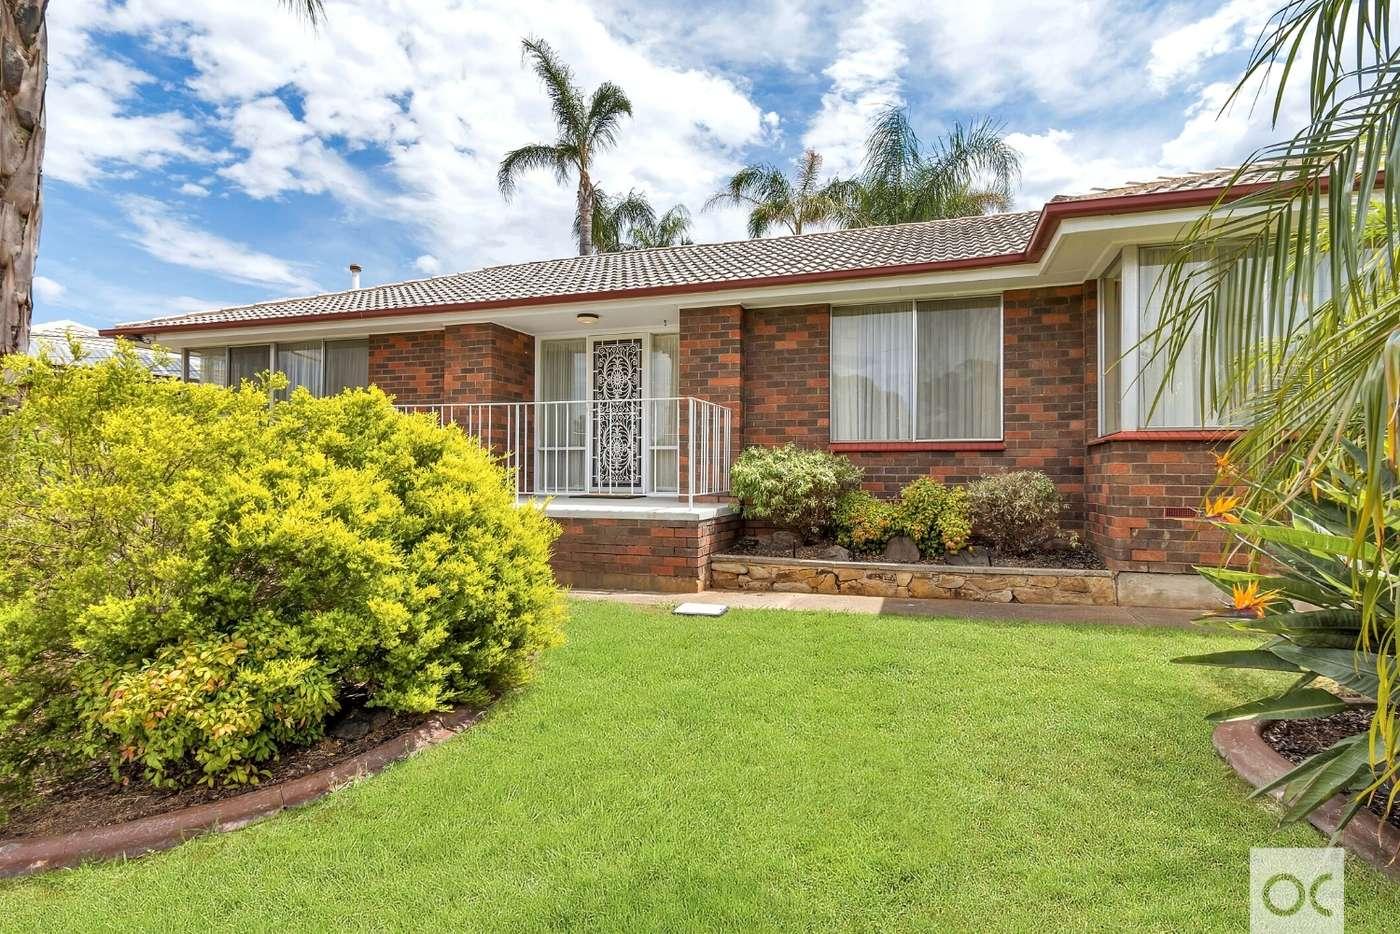 Main view of Homely house listing, 1 Pepe Court, Modbury North SA 5092